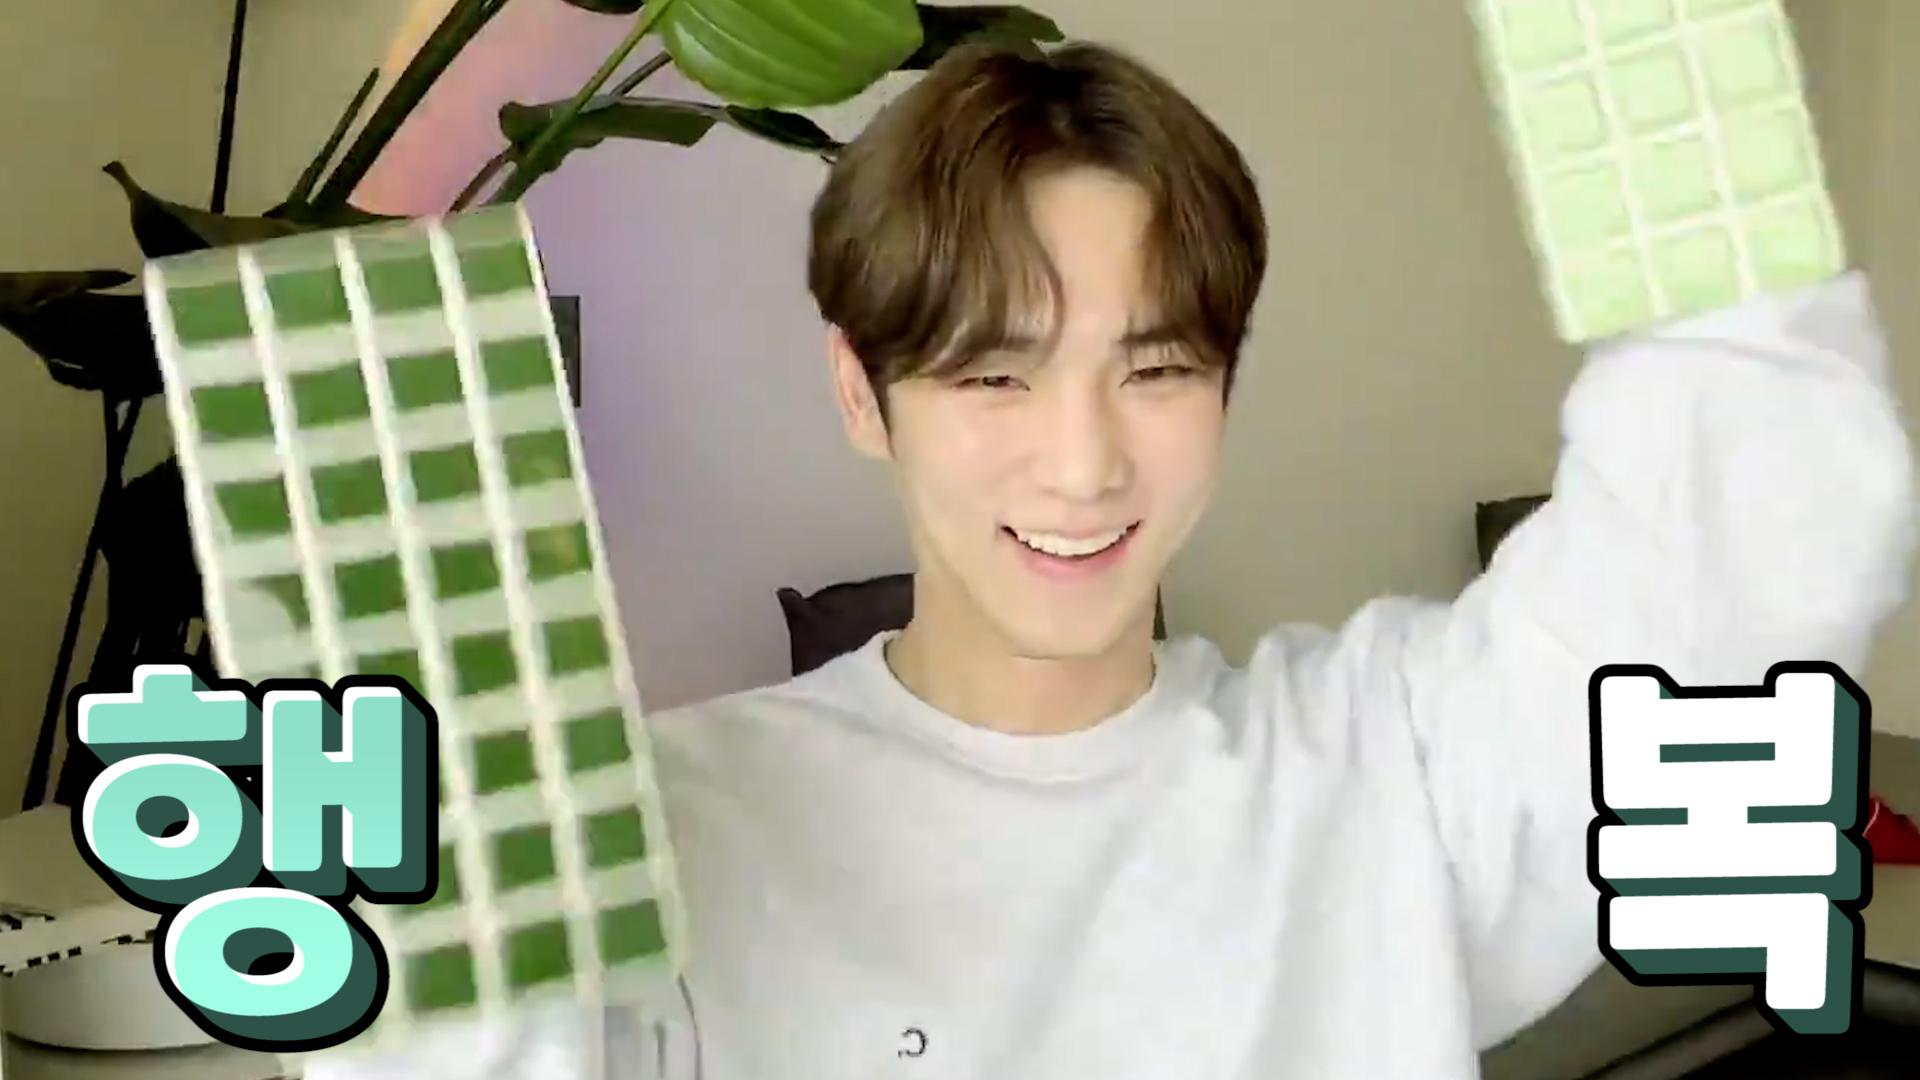 [SHINee] 예쁜 쓰레기(!) 언박싱도 기범이가 행복하다면 오케이입니다👍 (Key unboxing his new interior item)